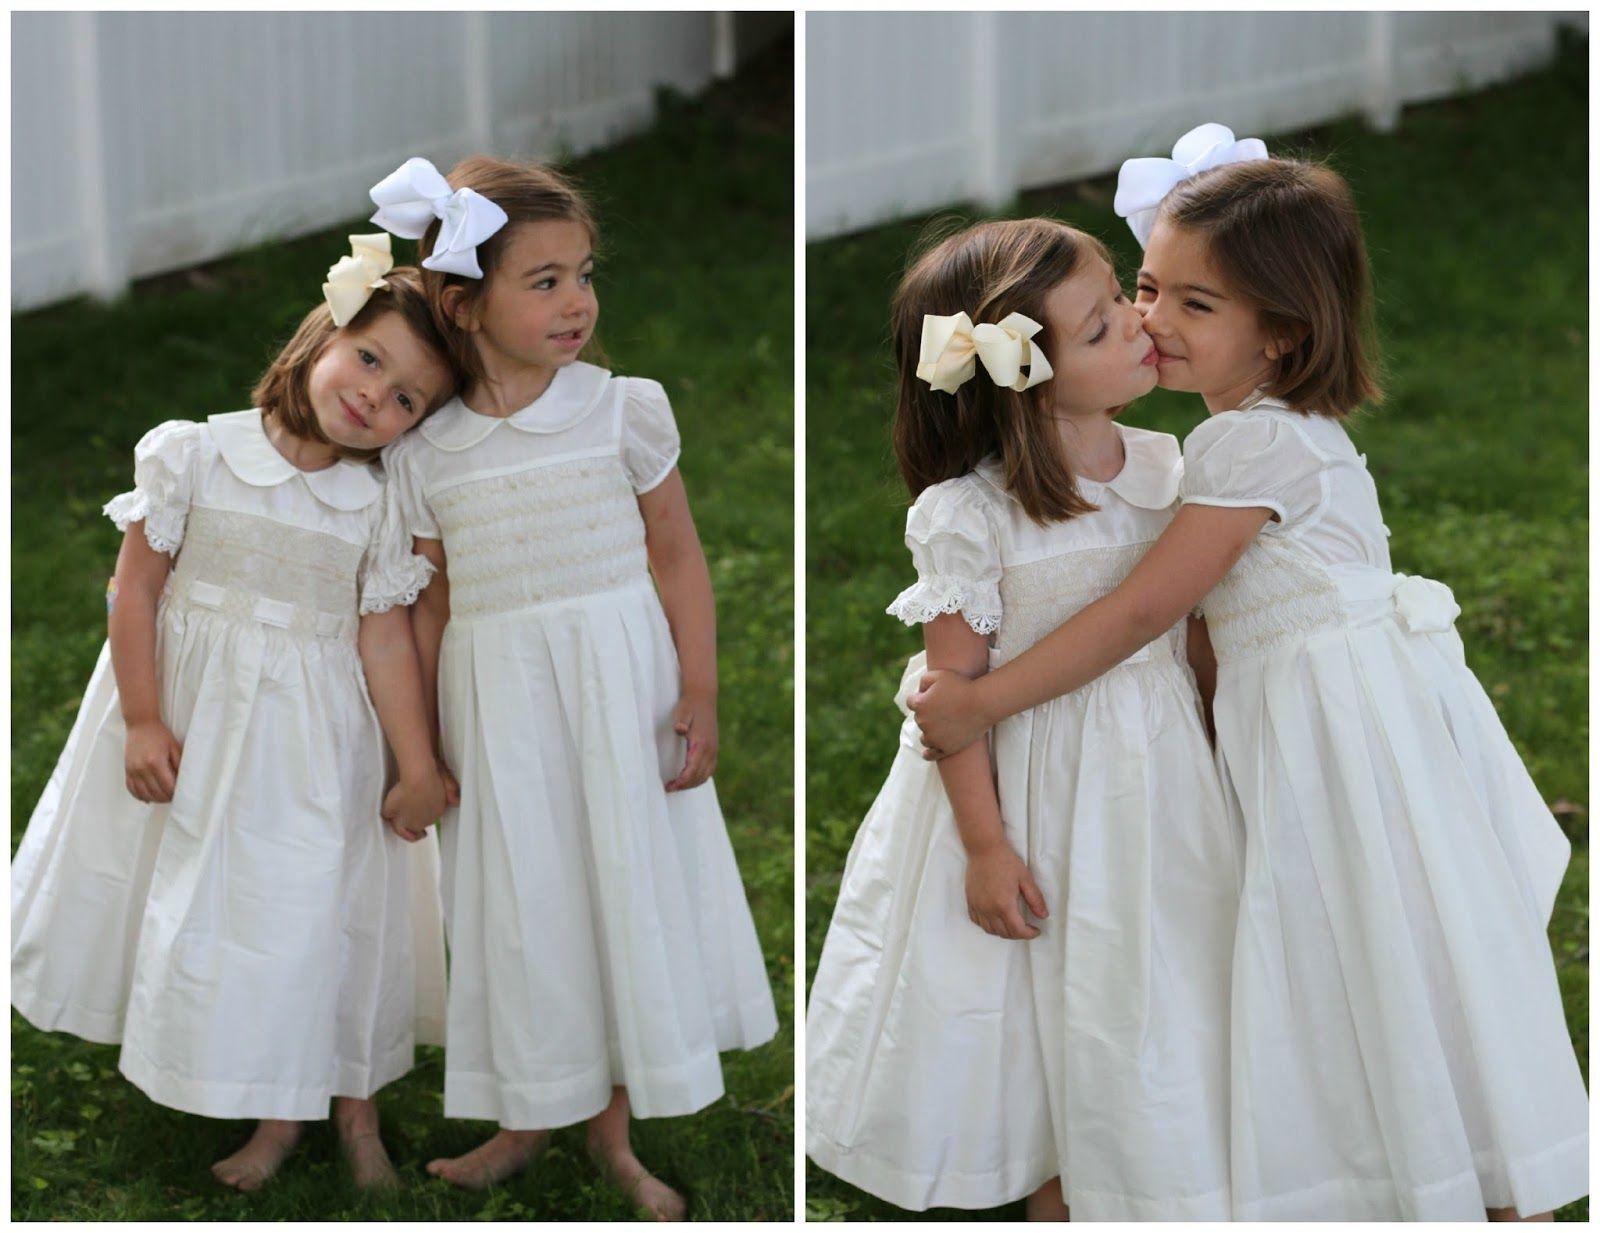 12b577cb7a0 Silk or cotton flower girl dresses